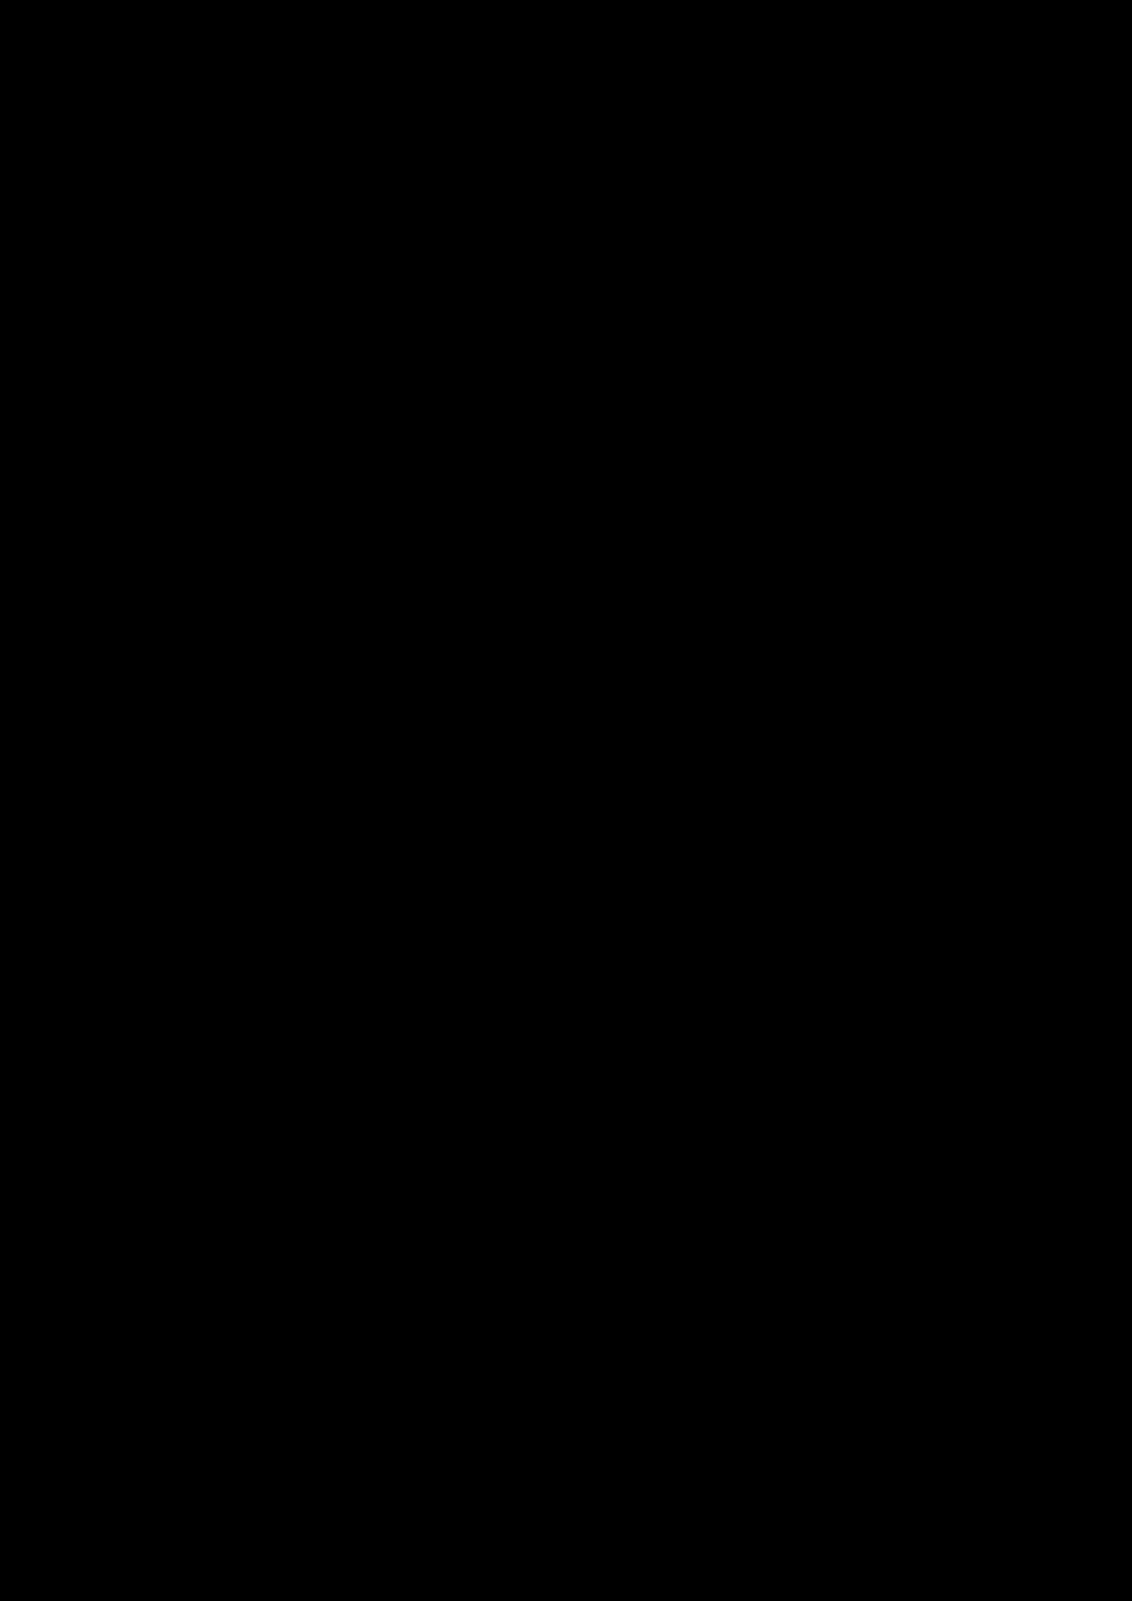 Belyiy sokol slide, Image 69